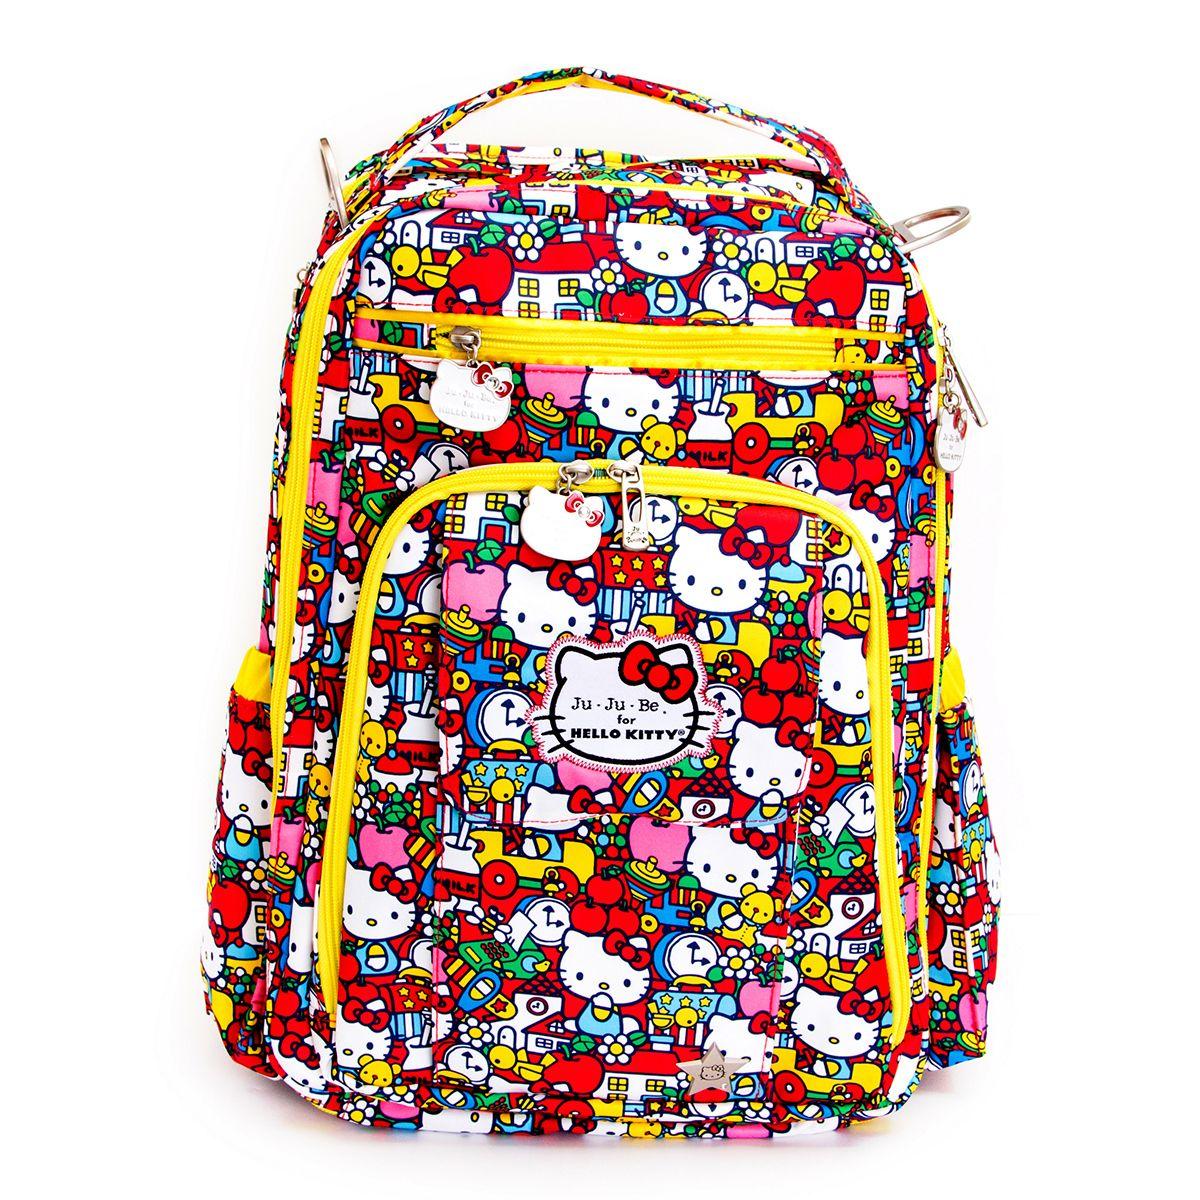 059065e4da77 Ju-Ju-Be Be Right Back Tick Tock Hello Kitty Diaper Backpack ...